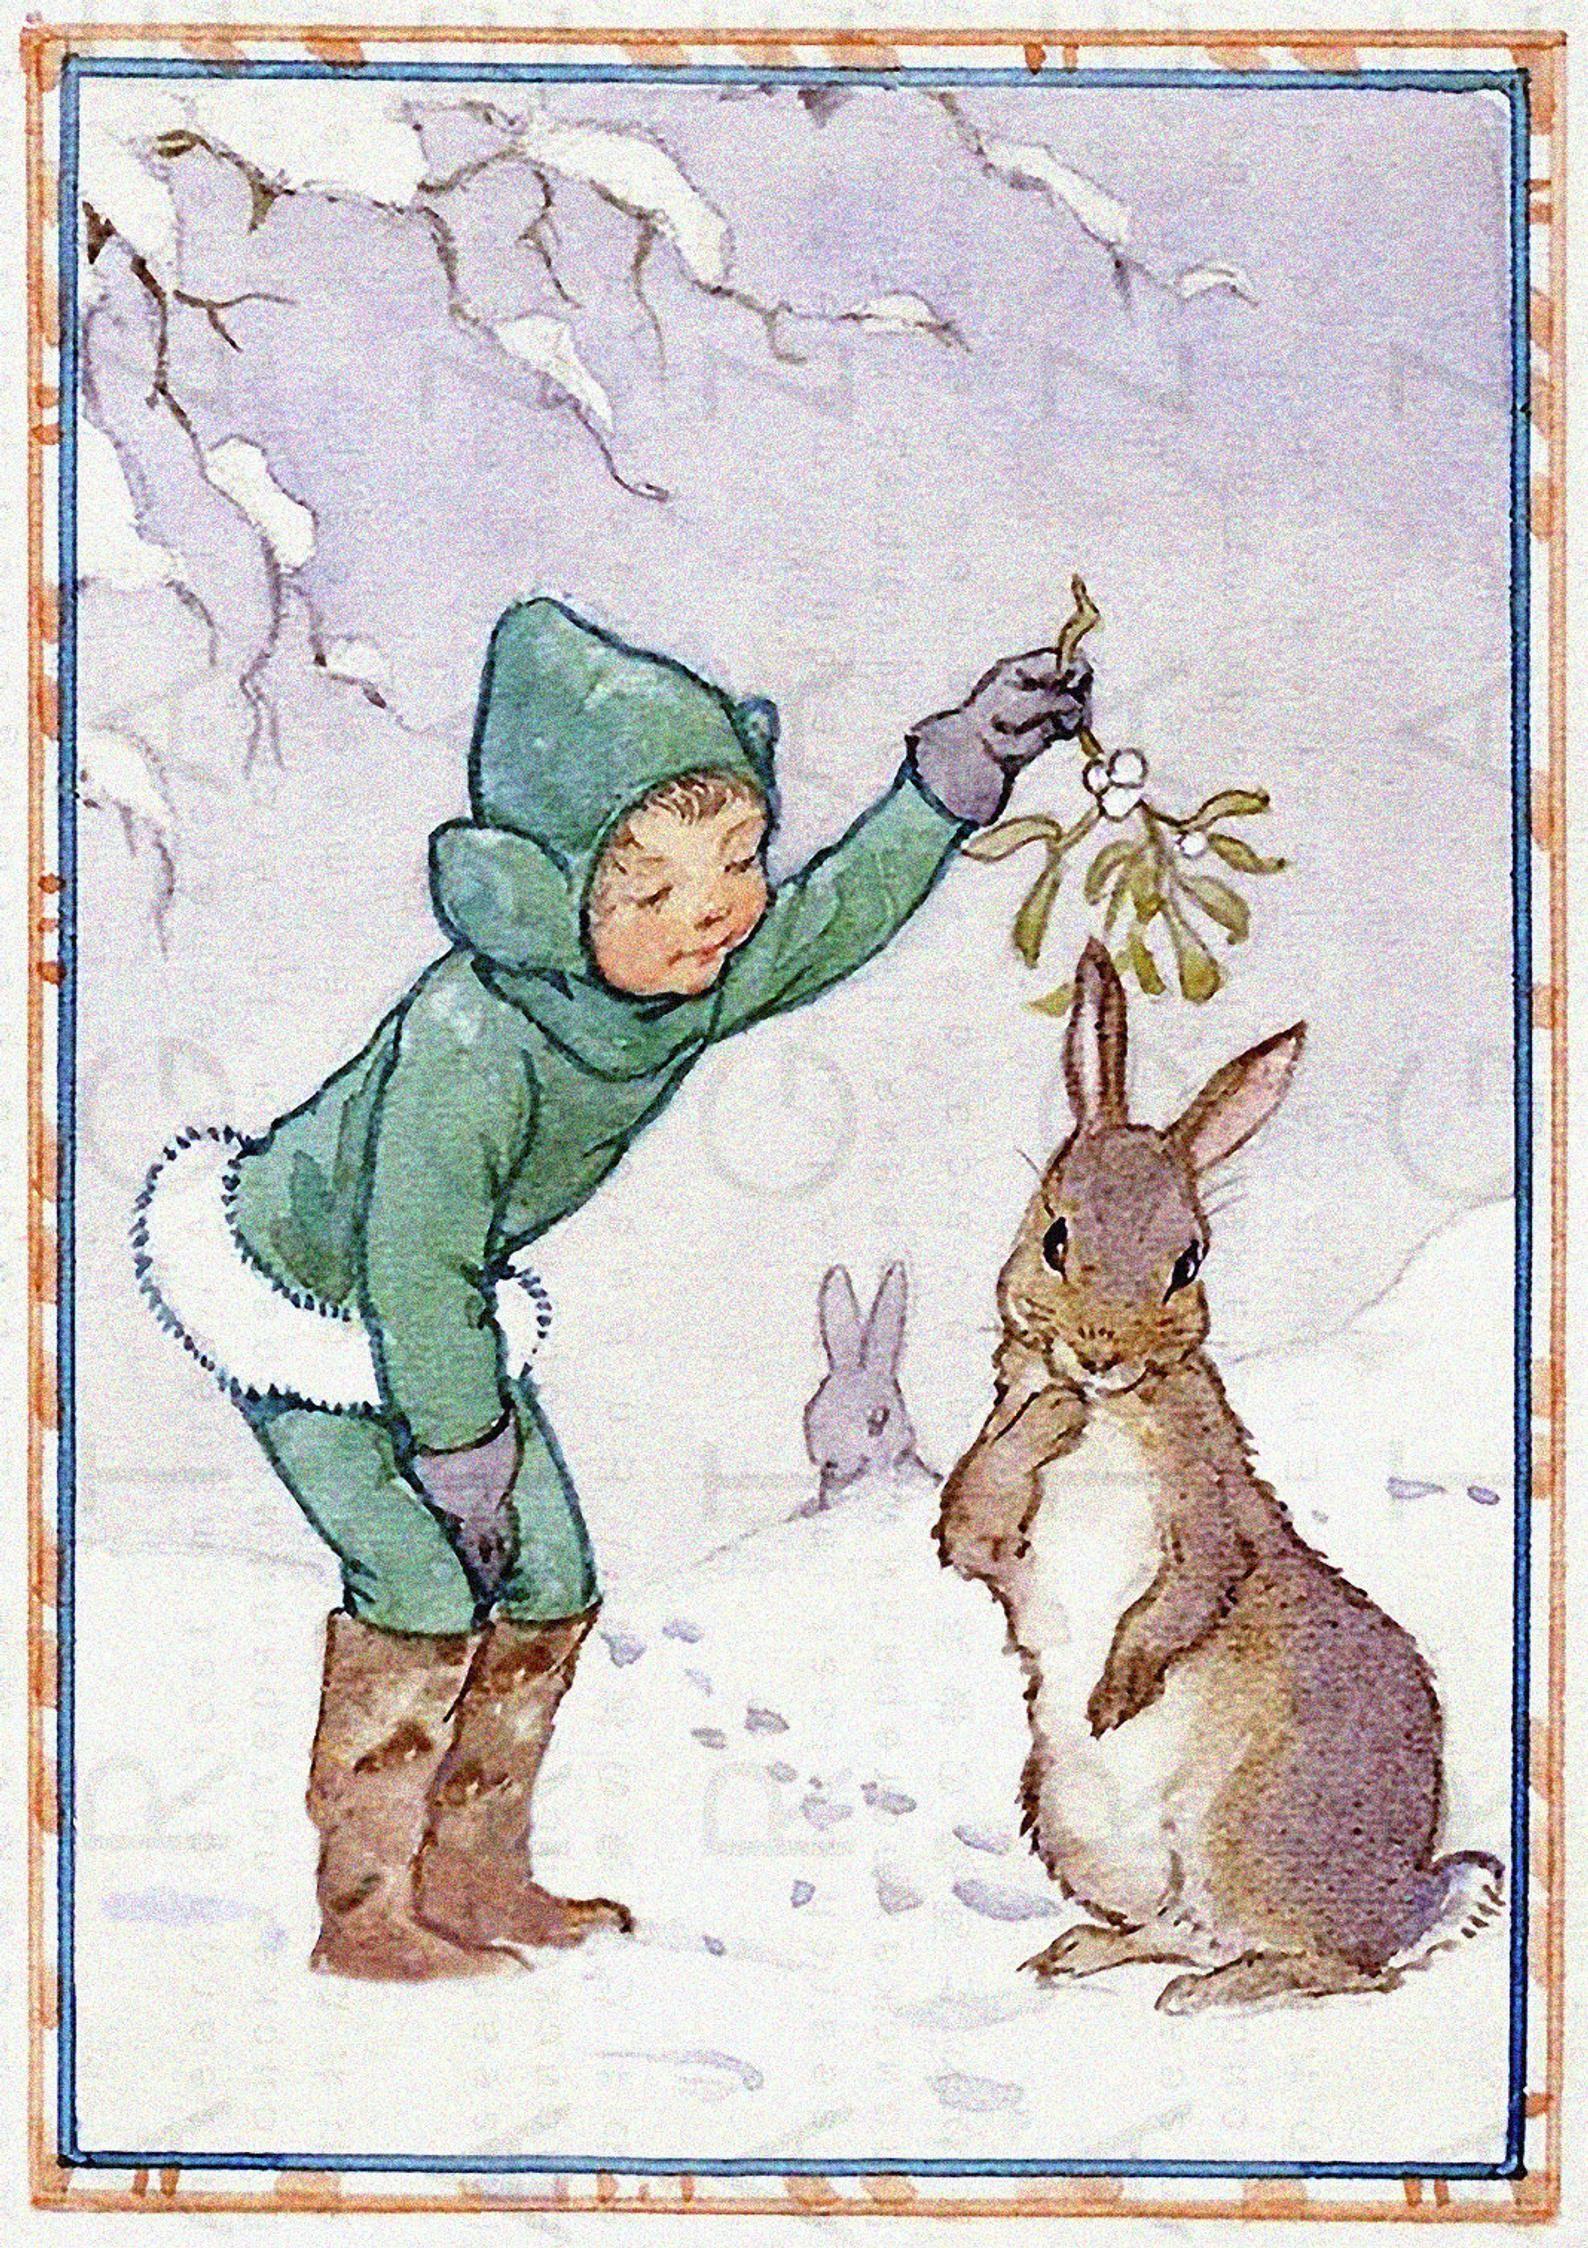 Christmas Elf Bunny Under A Mistletoe Branch Vintage Christmas Illustration Adorable Digital Christmas Download In 2020 Christmas Illustration Bunny Art Illustrators